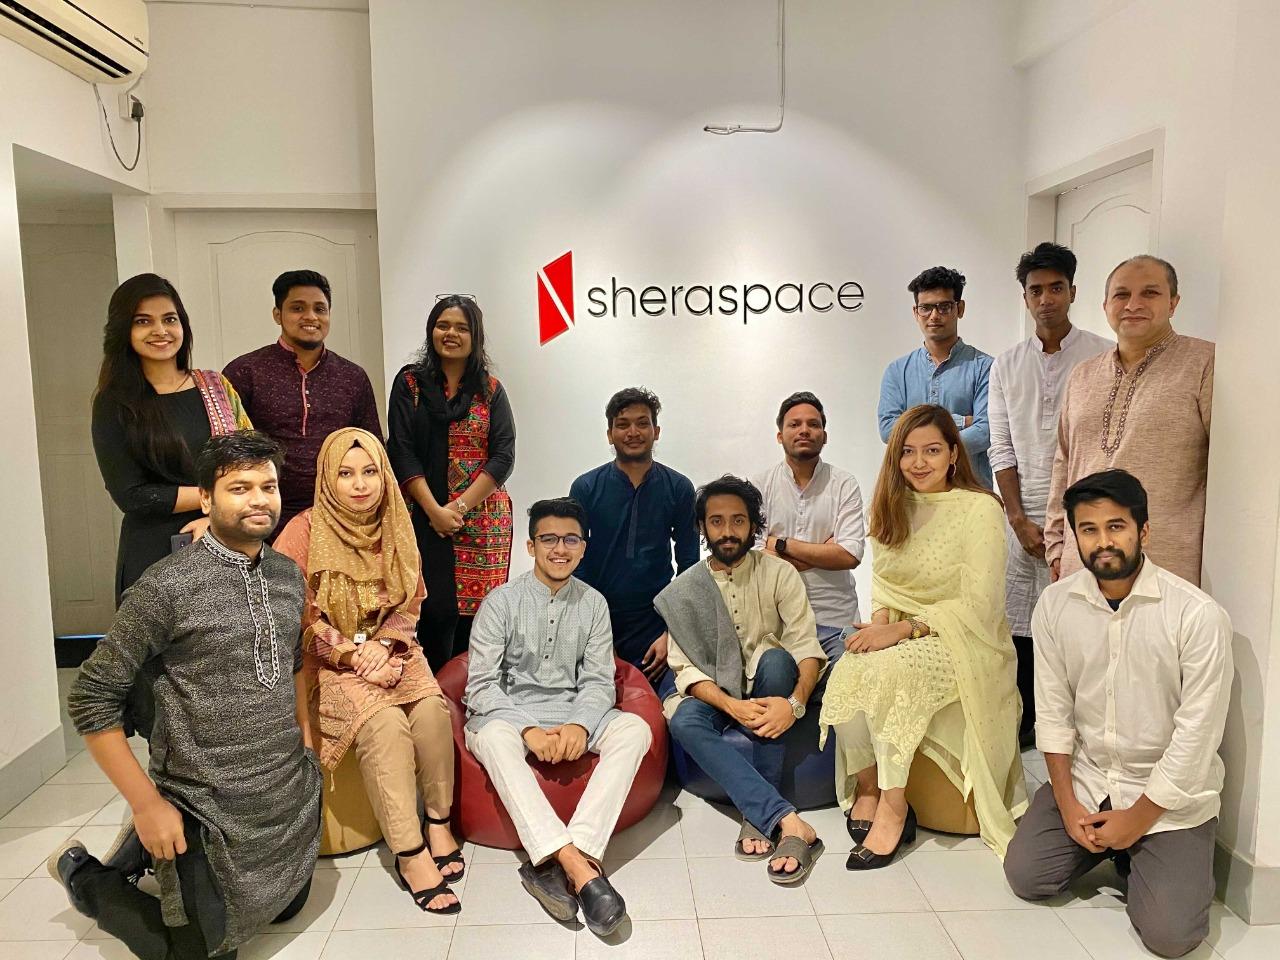 Sheraspace working to democratise interior design in BD